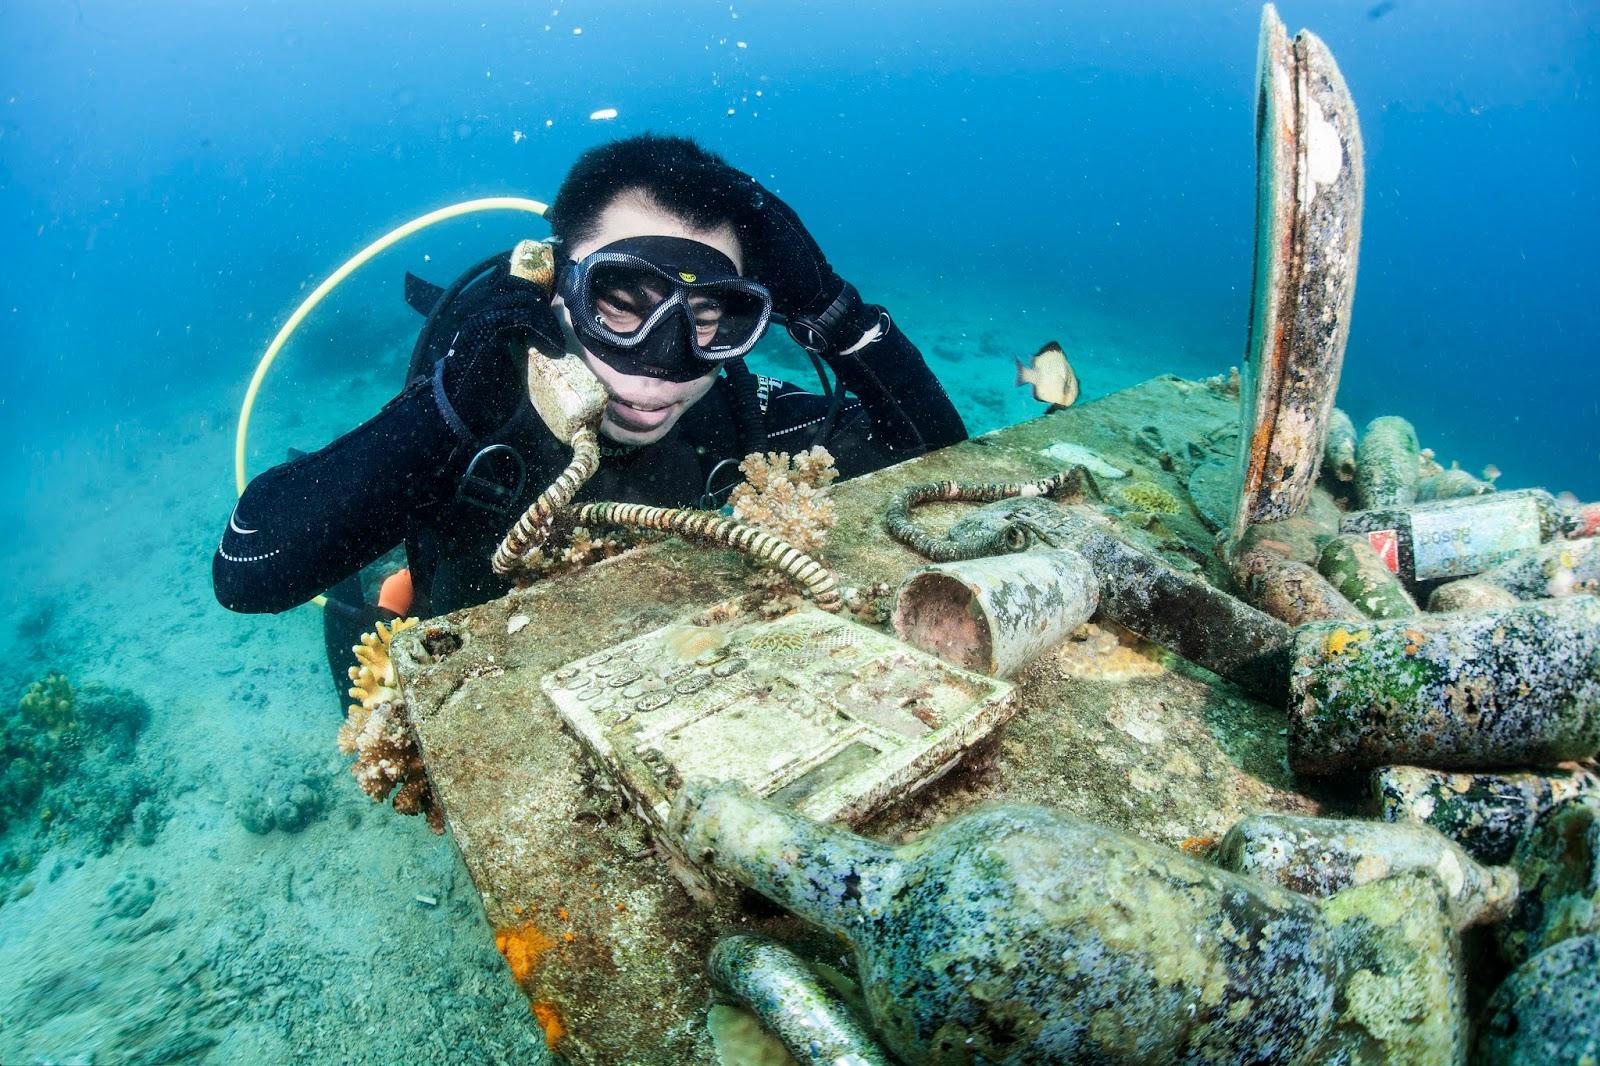 Underwater Motorbikes Anilao - PaparazSea